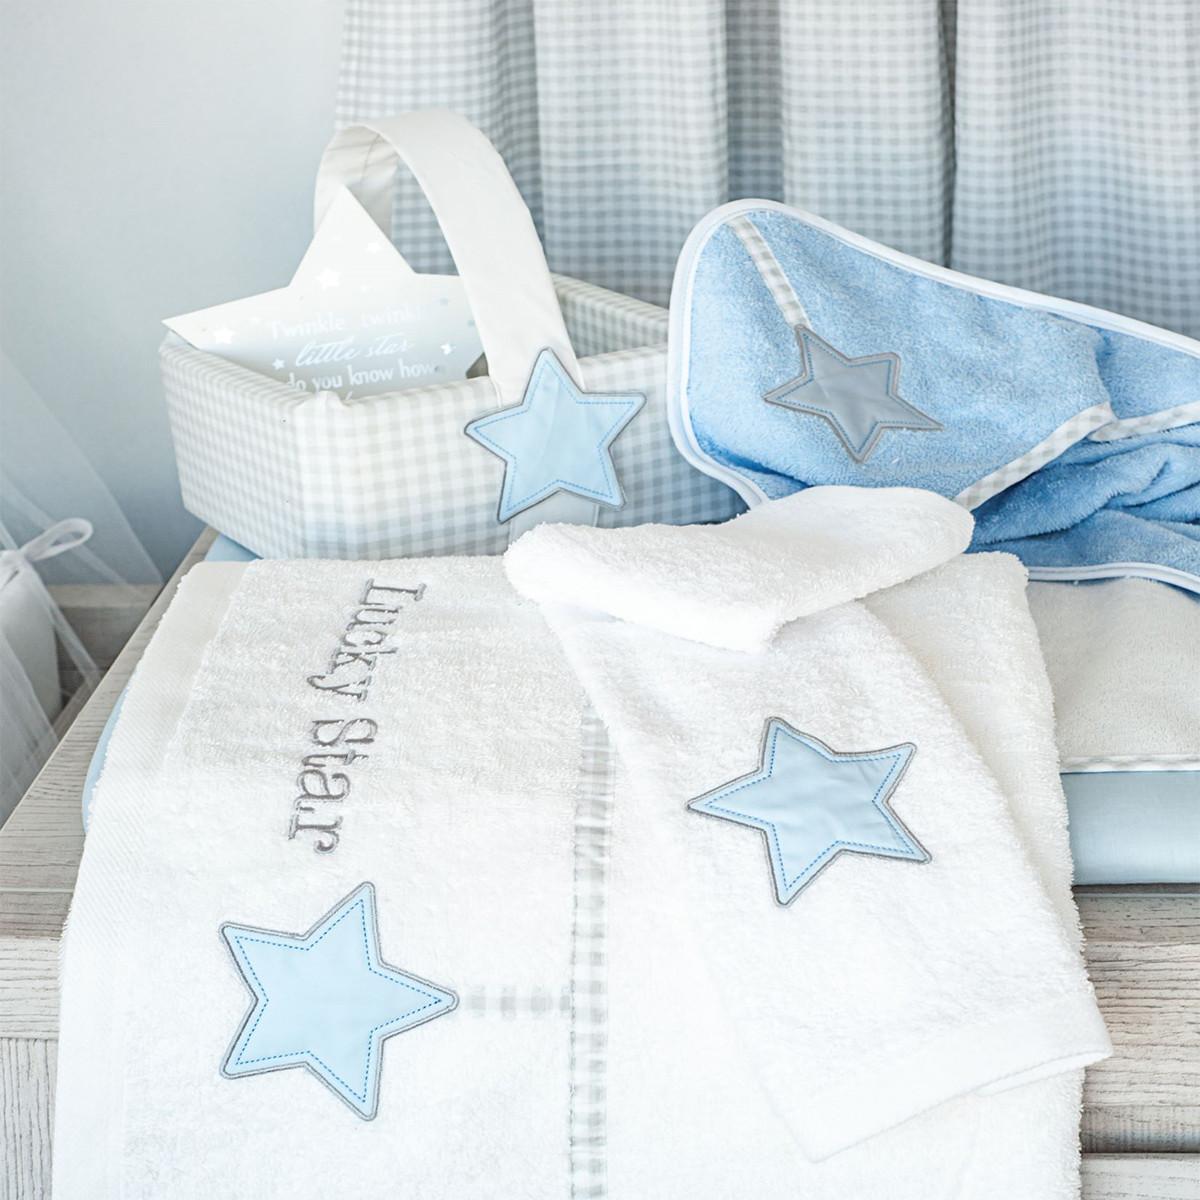 68aefdf5fe4 Καλαθάκι Καλλυντικών Baby Oliver Lucky Star Blue 309 106442